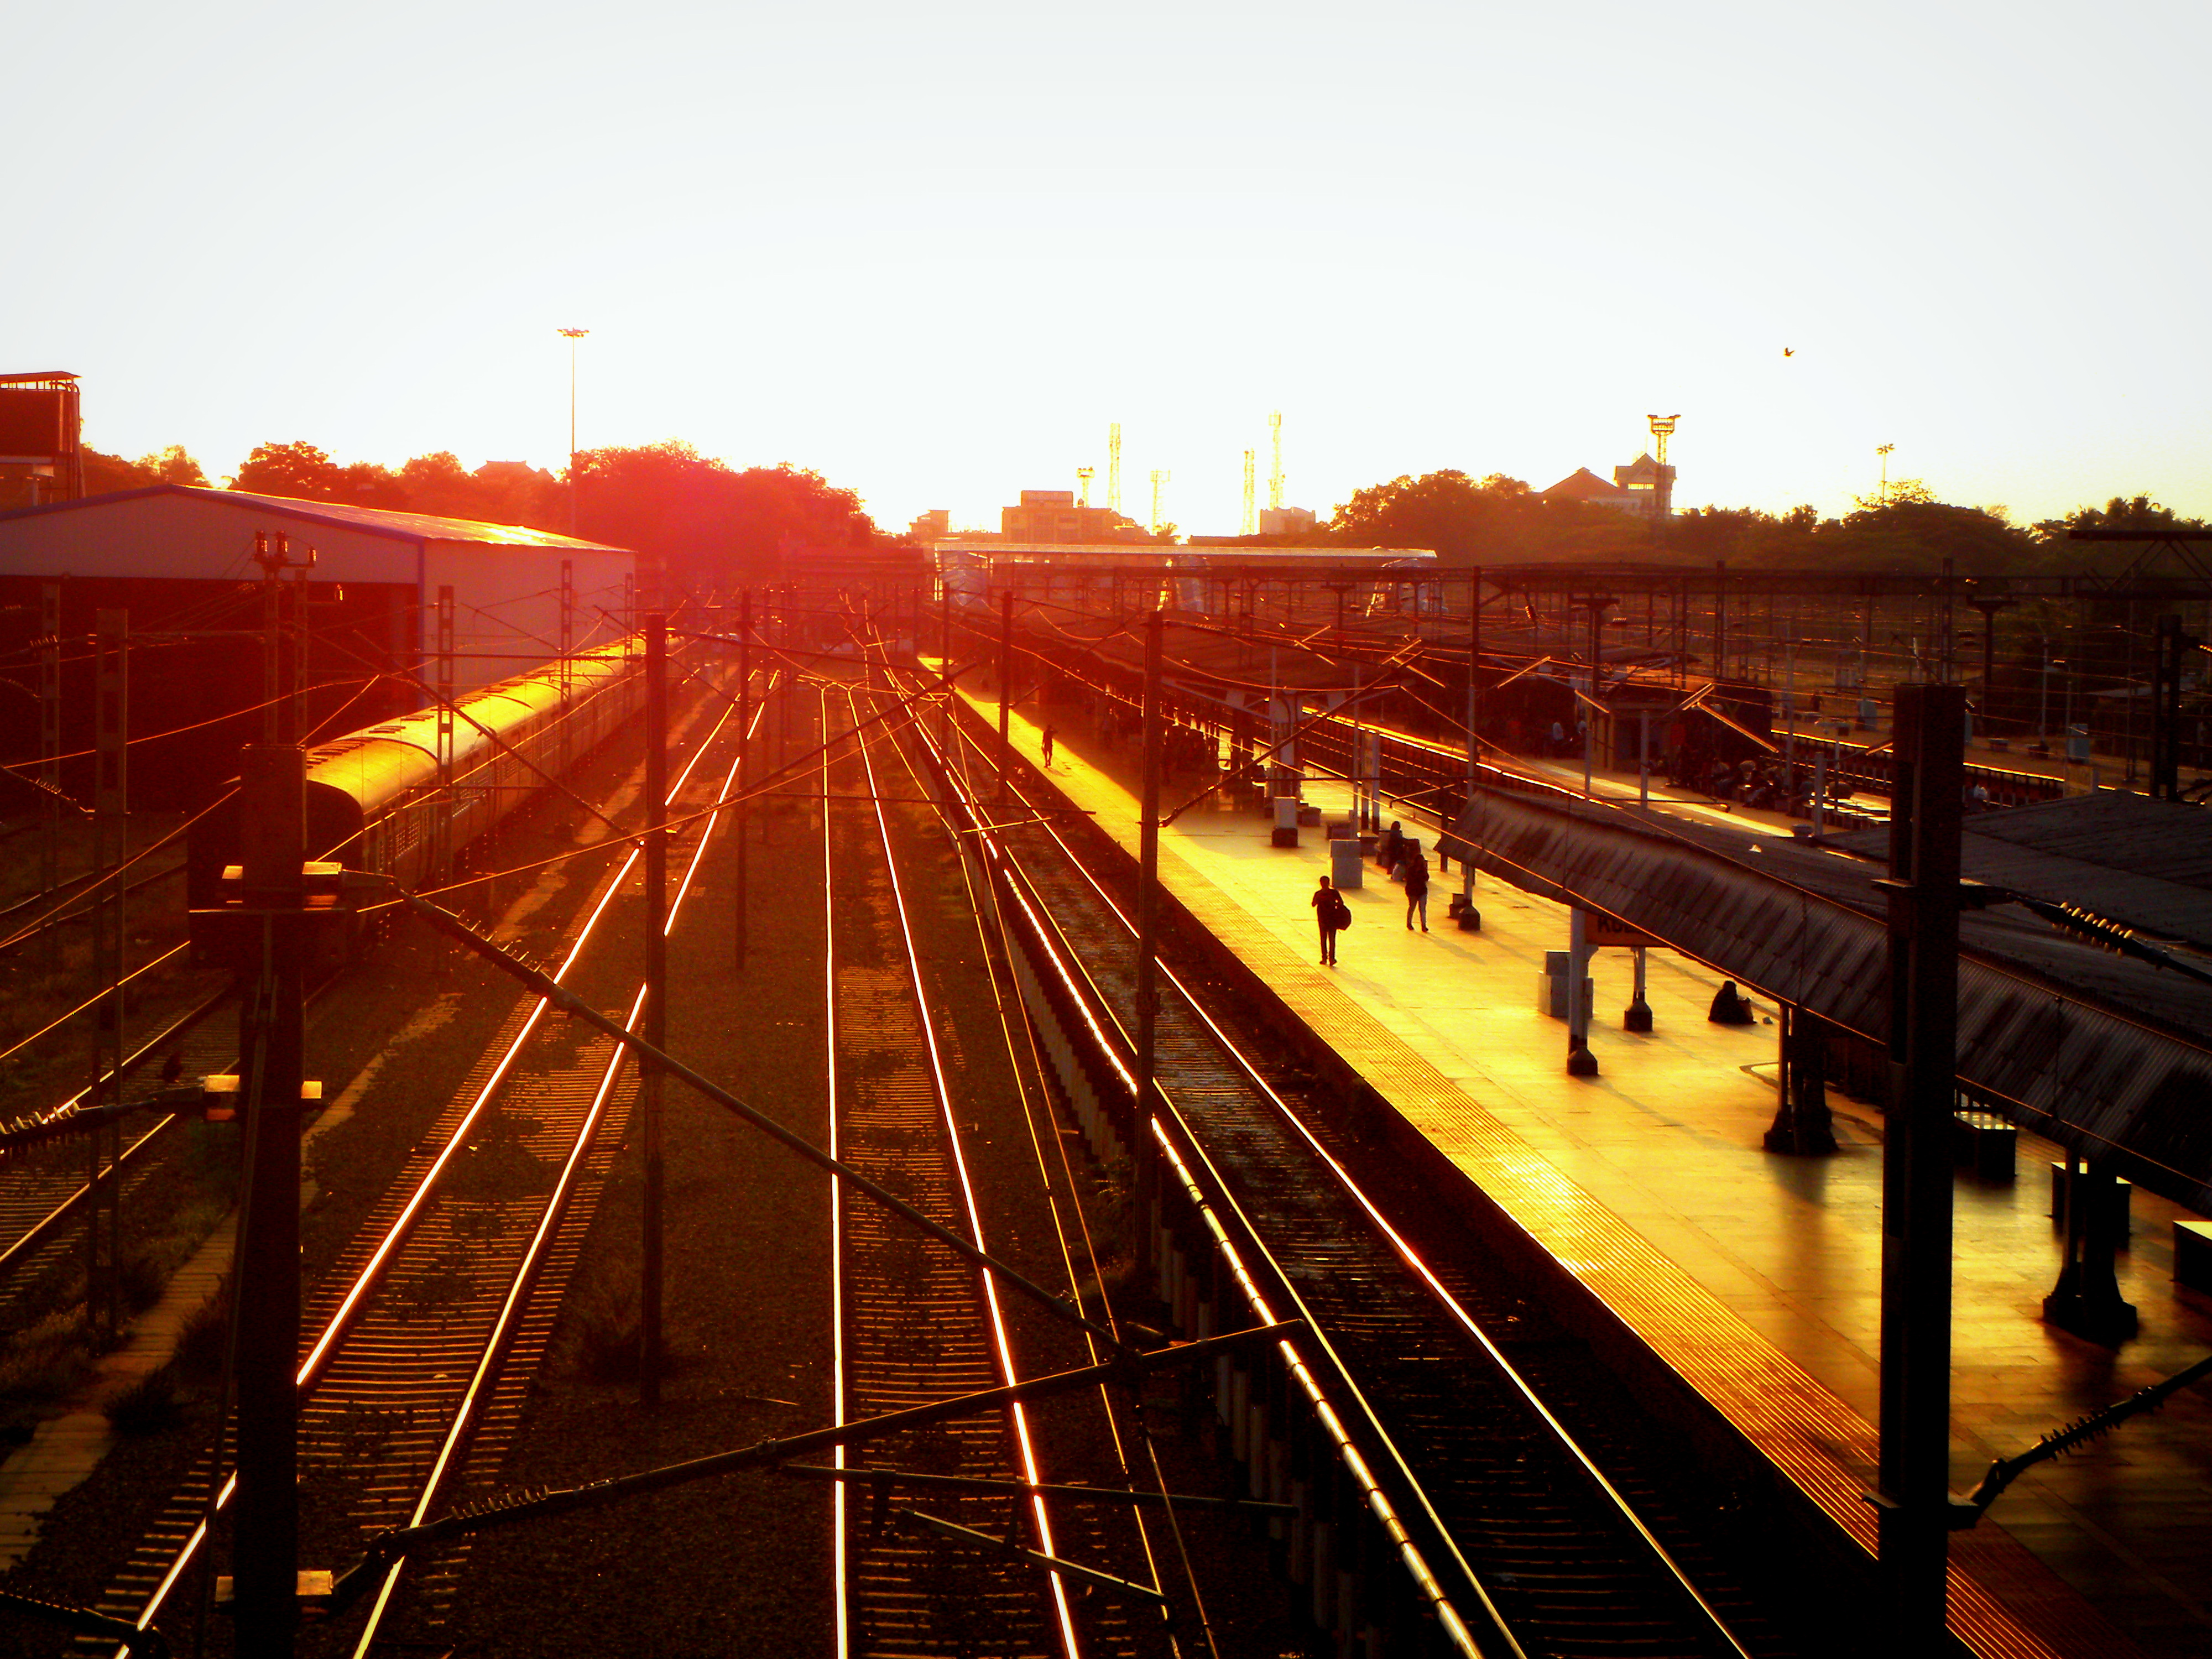 Evening railway view photo